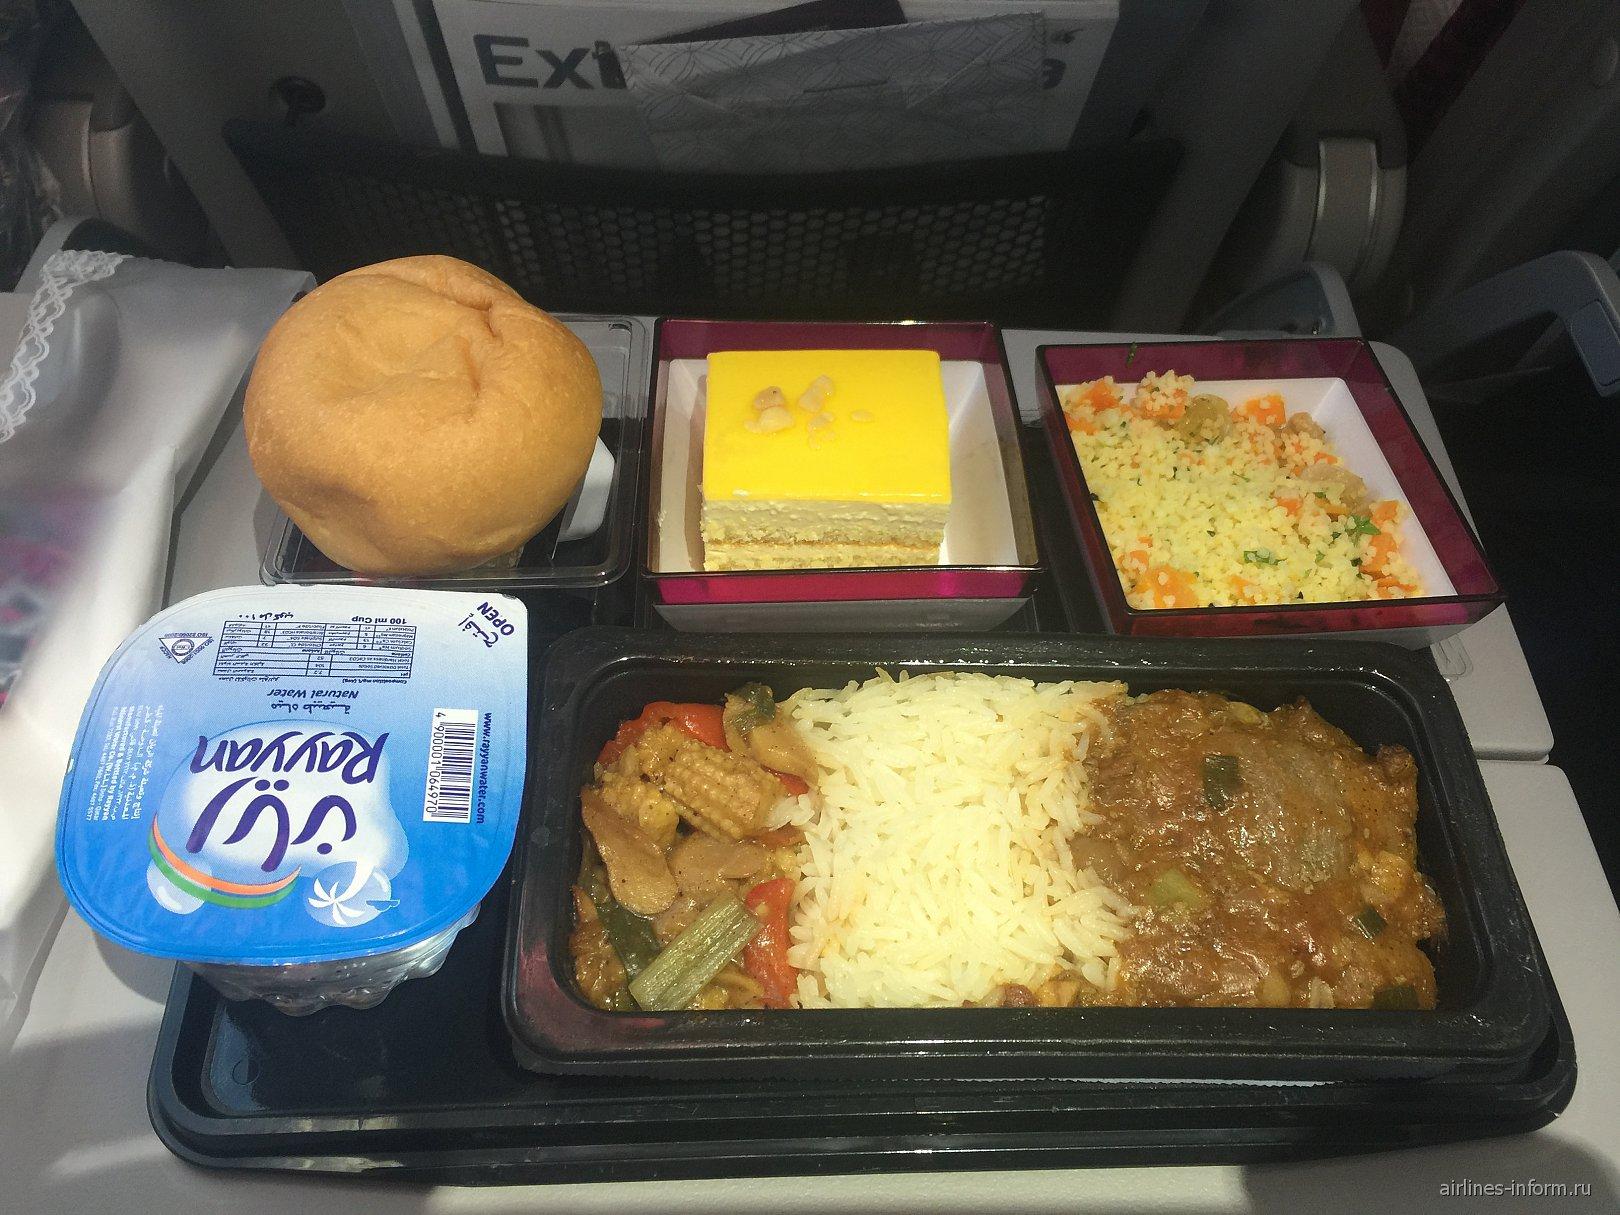 Бортовое питание на рейсе Москва-Доха Катарских авиалиний